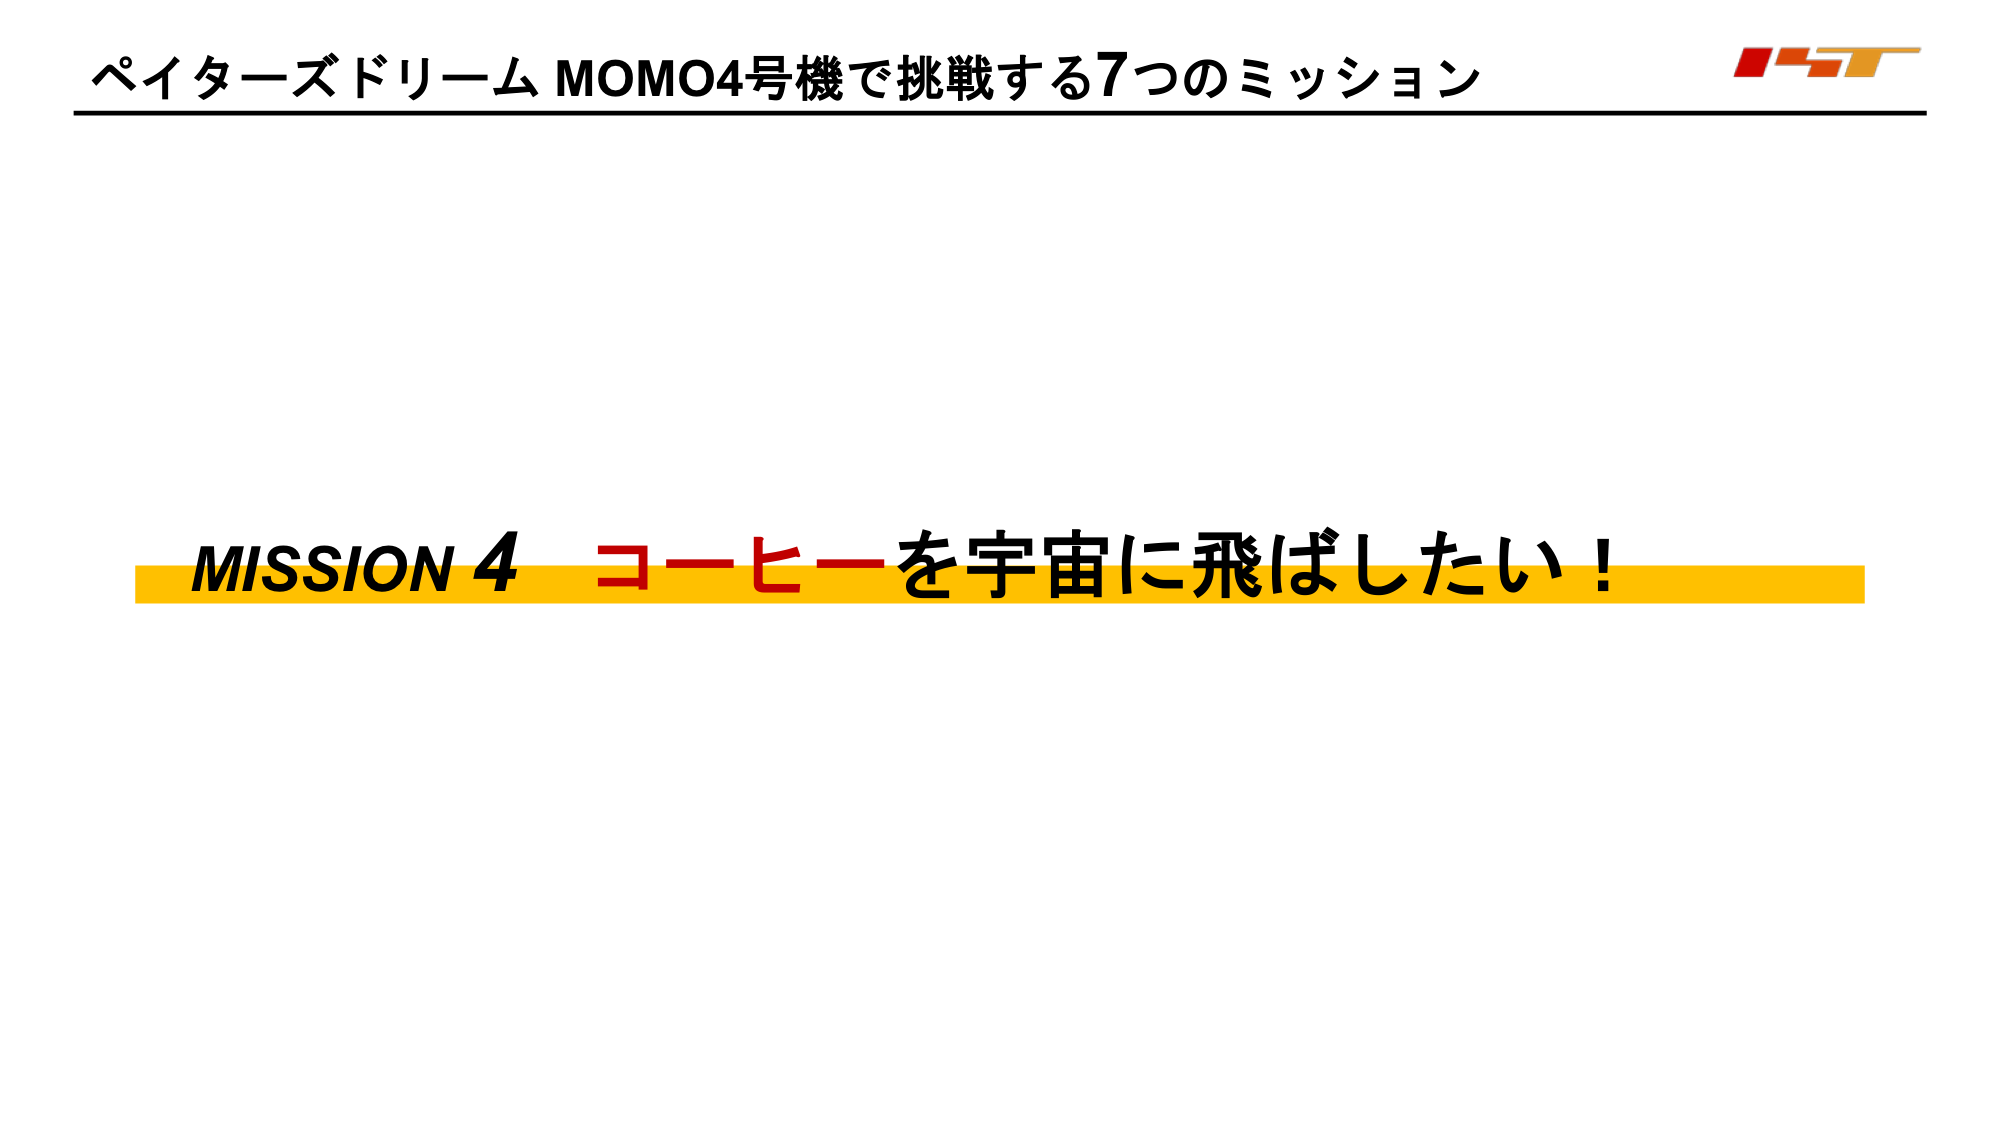 f:id:Imamura:20190628161303p:plain